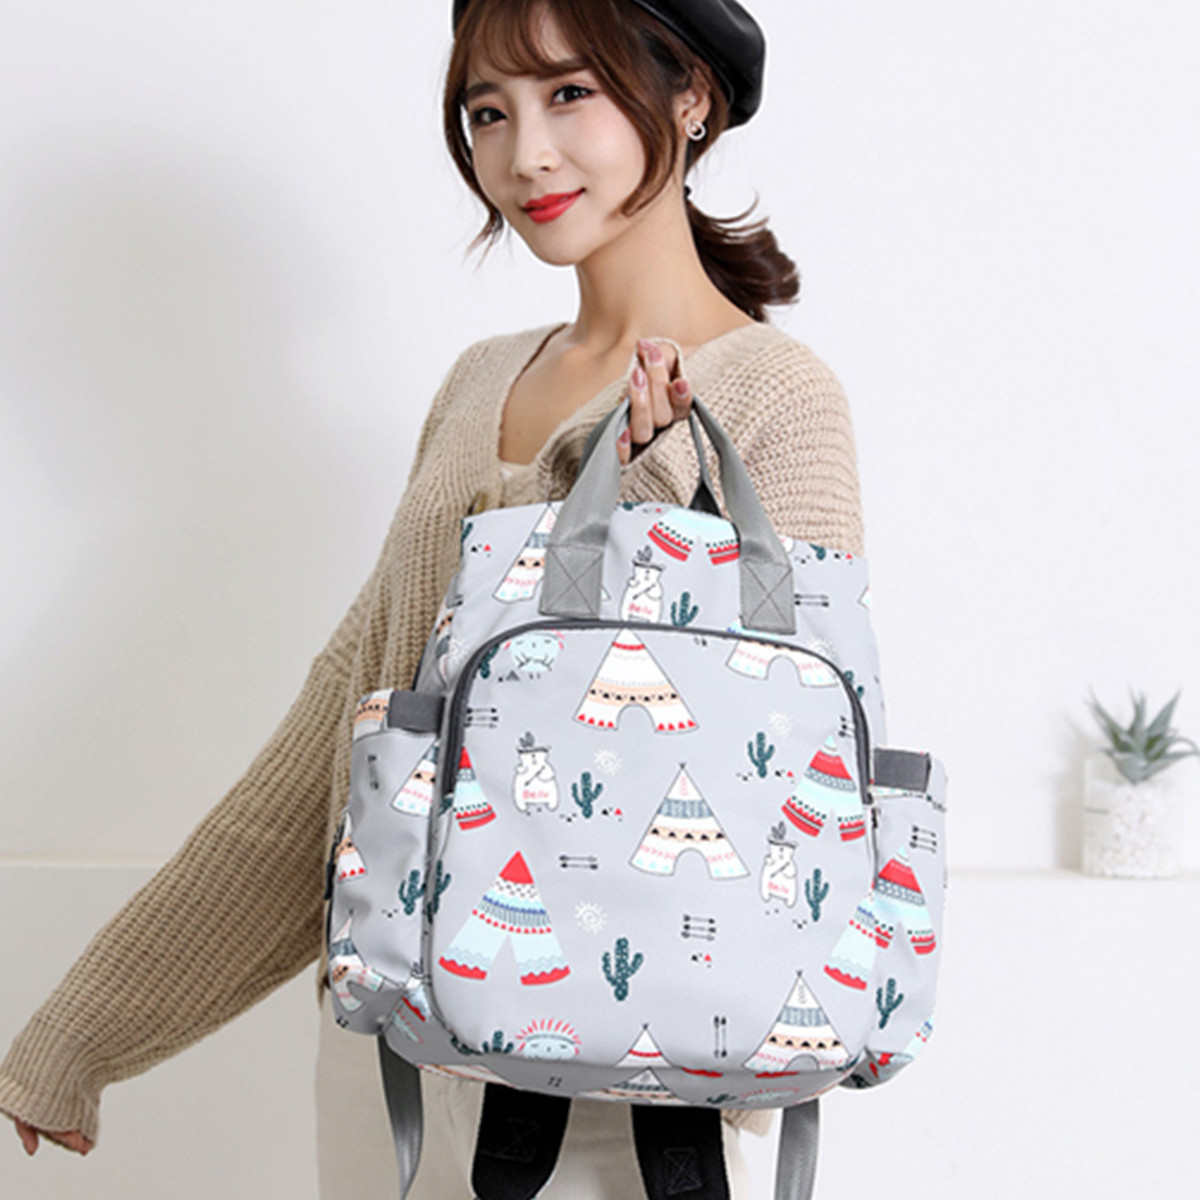 Women Travel Luggage Bag Waterproof Baby Diaper Bag Mummy Bag Nappy Storage Bag Handbag